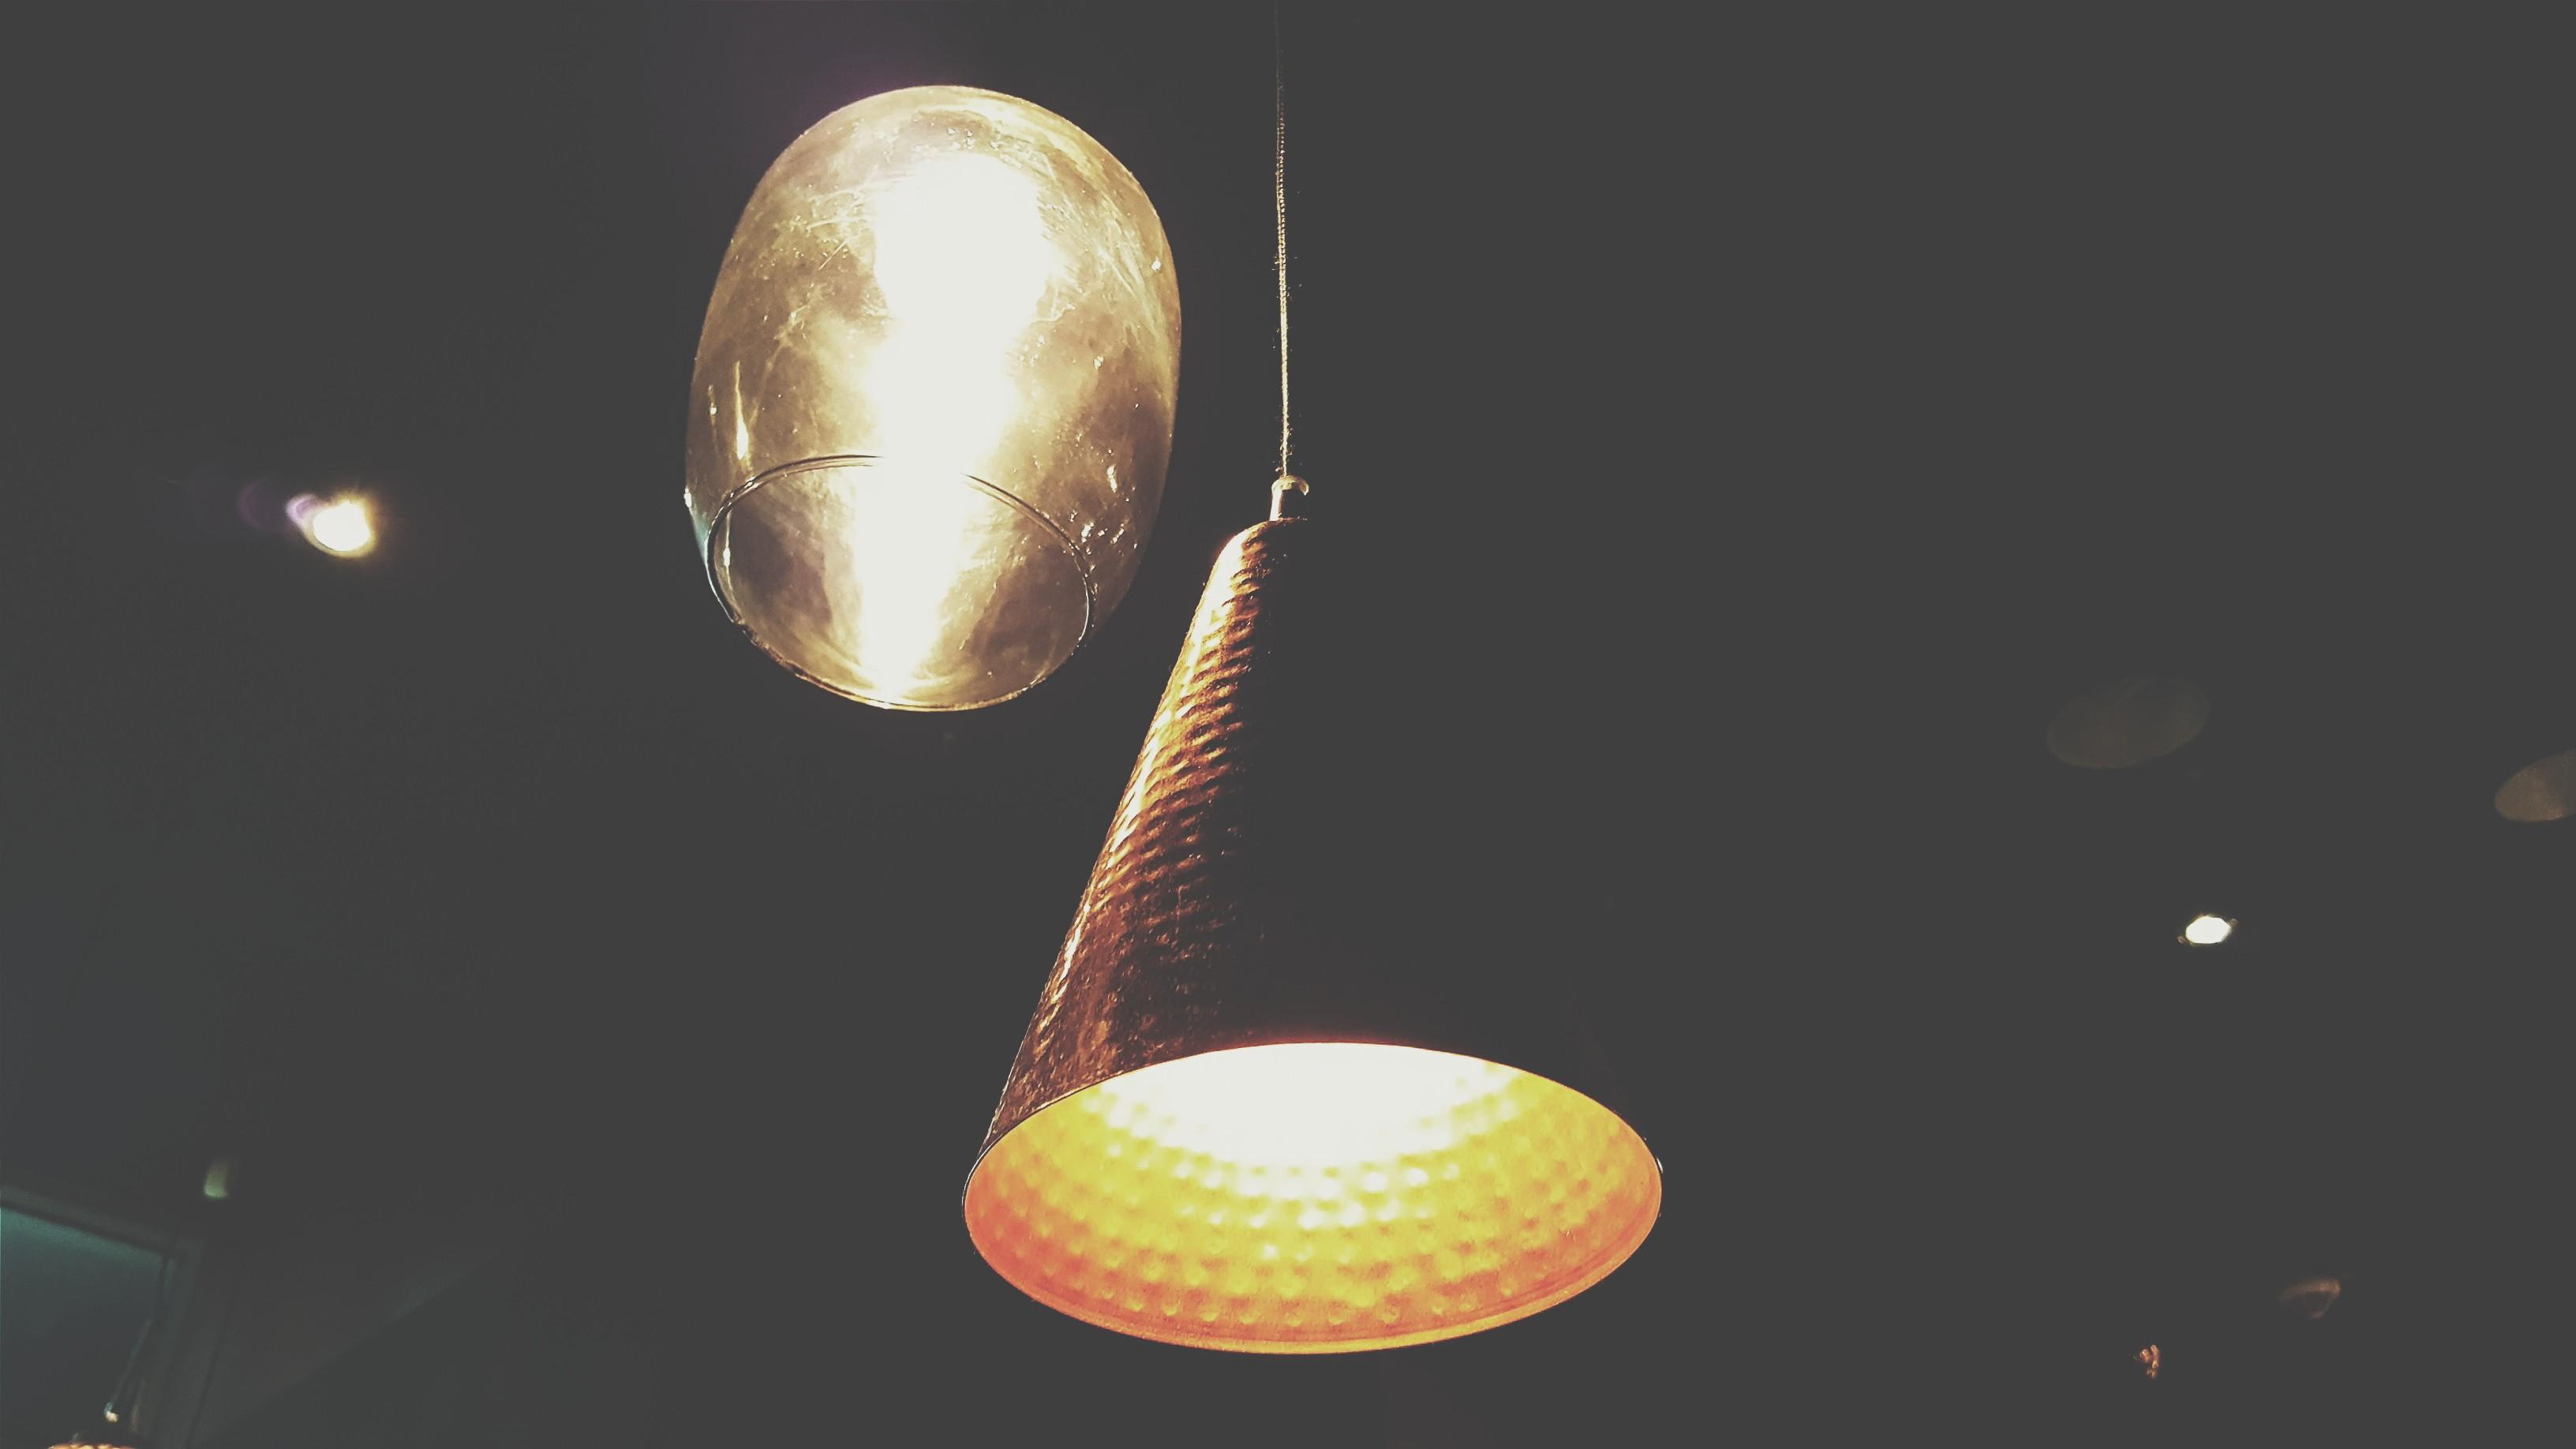 Wallpaper : planet, sphere, Moon, lamp, circle, light